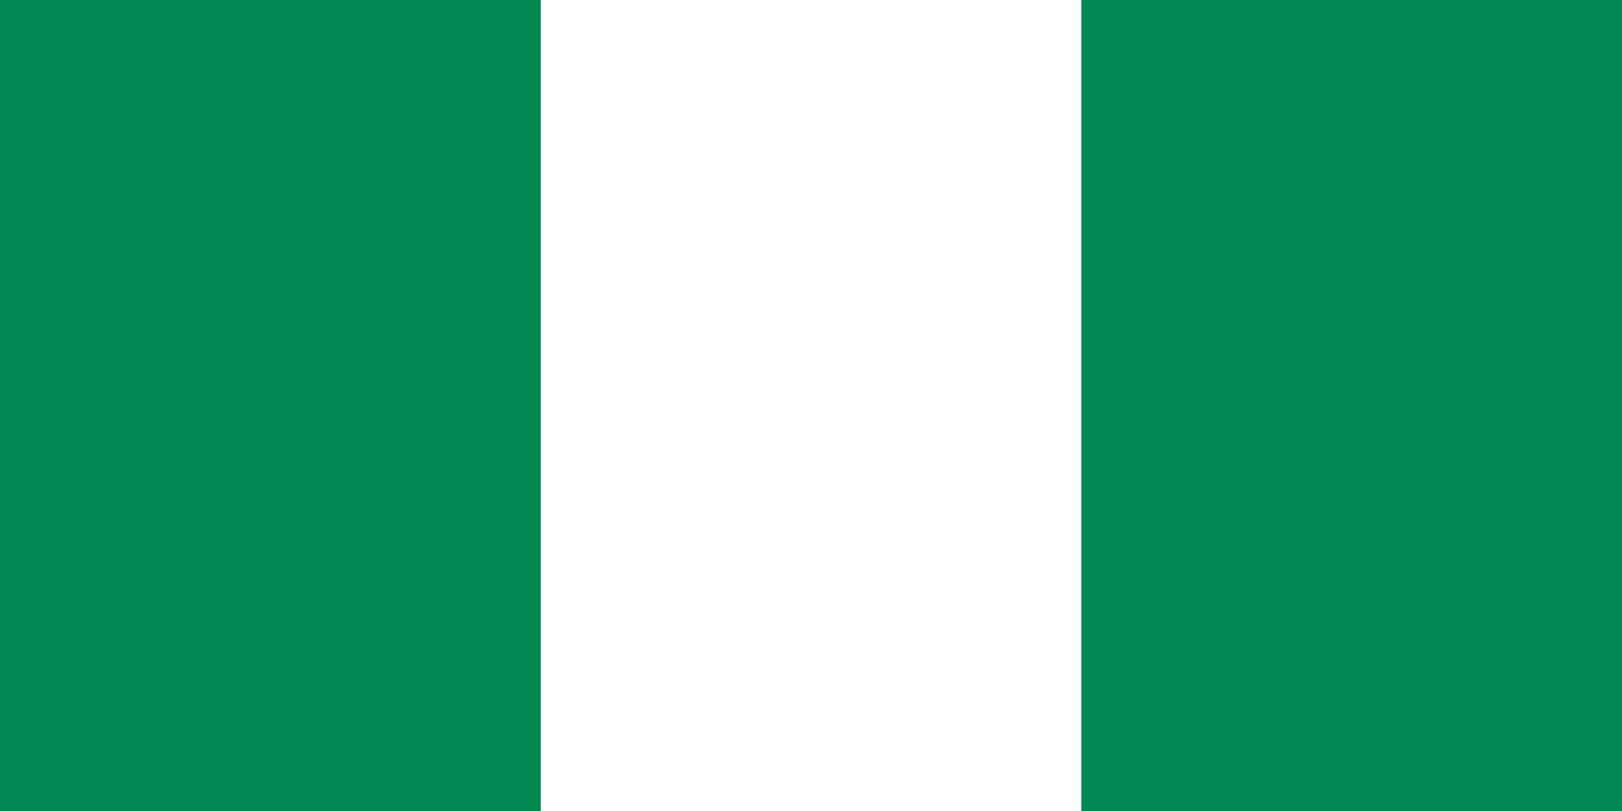 Flagge im Querformat Land Nigeria 150x100 cm